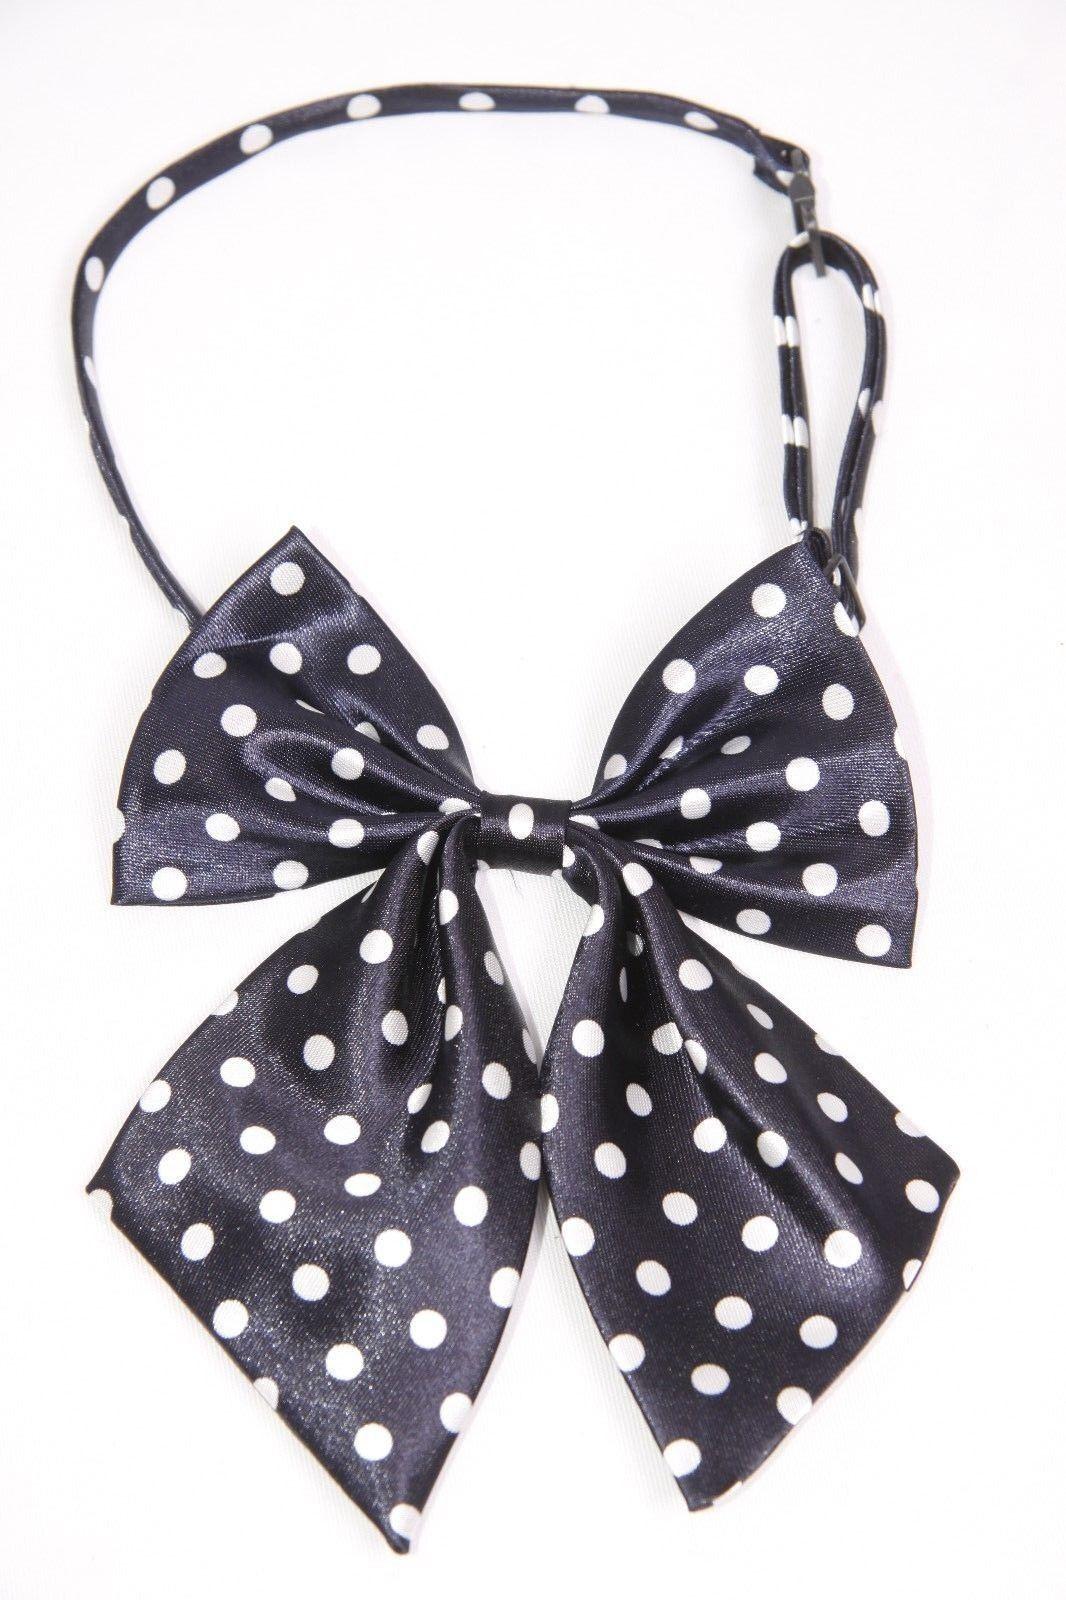 s152 Dark Blue Denim /& White Polka Dot Print Girly Headband W Bow Detail